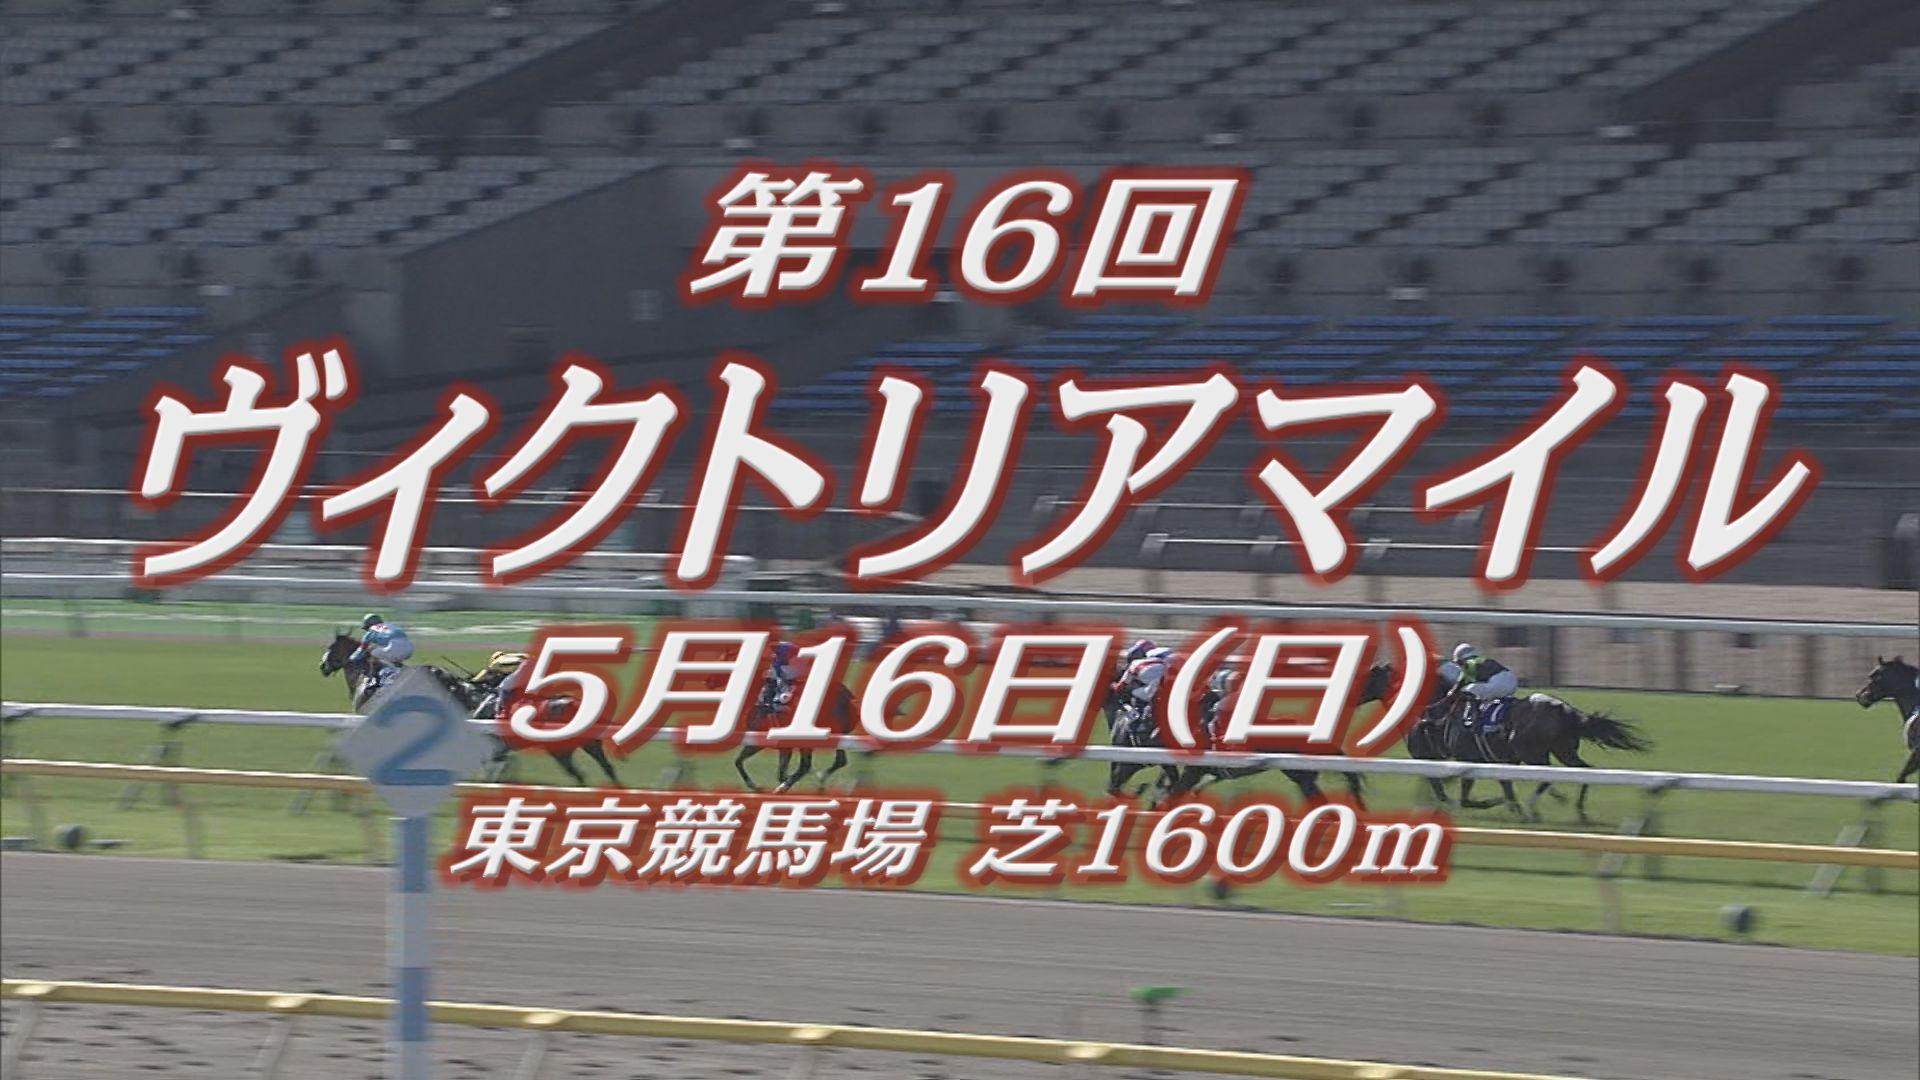 【GⅠレース出走予定馬紹介】ヴィクトリアマイル 5/16 (日) 東京競馬場